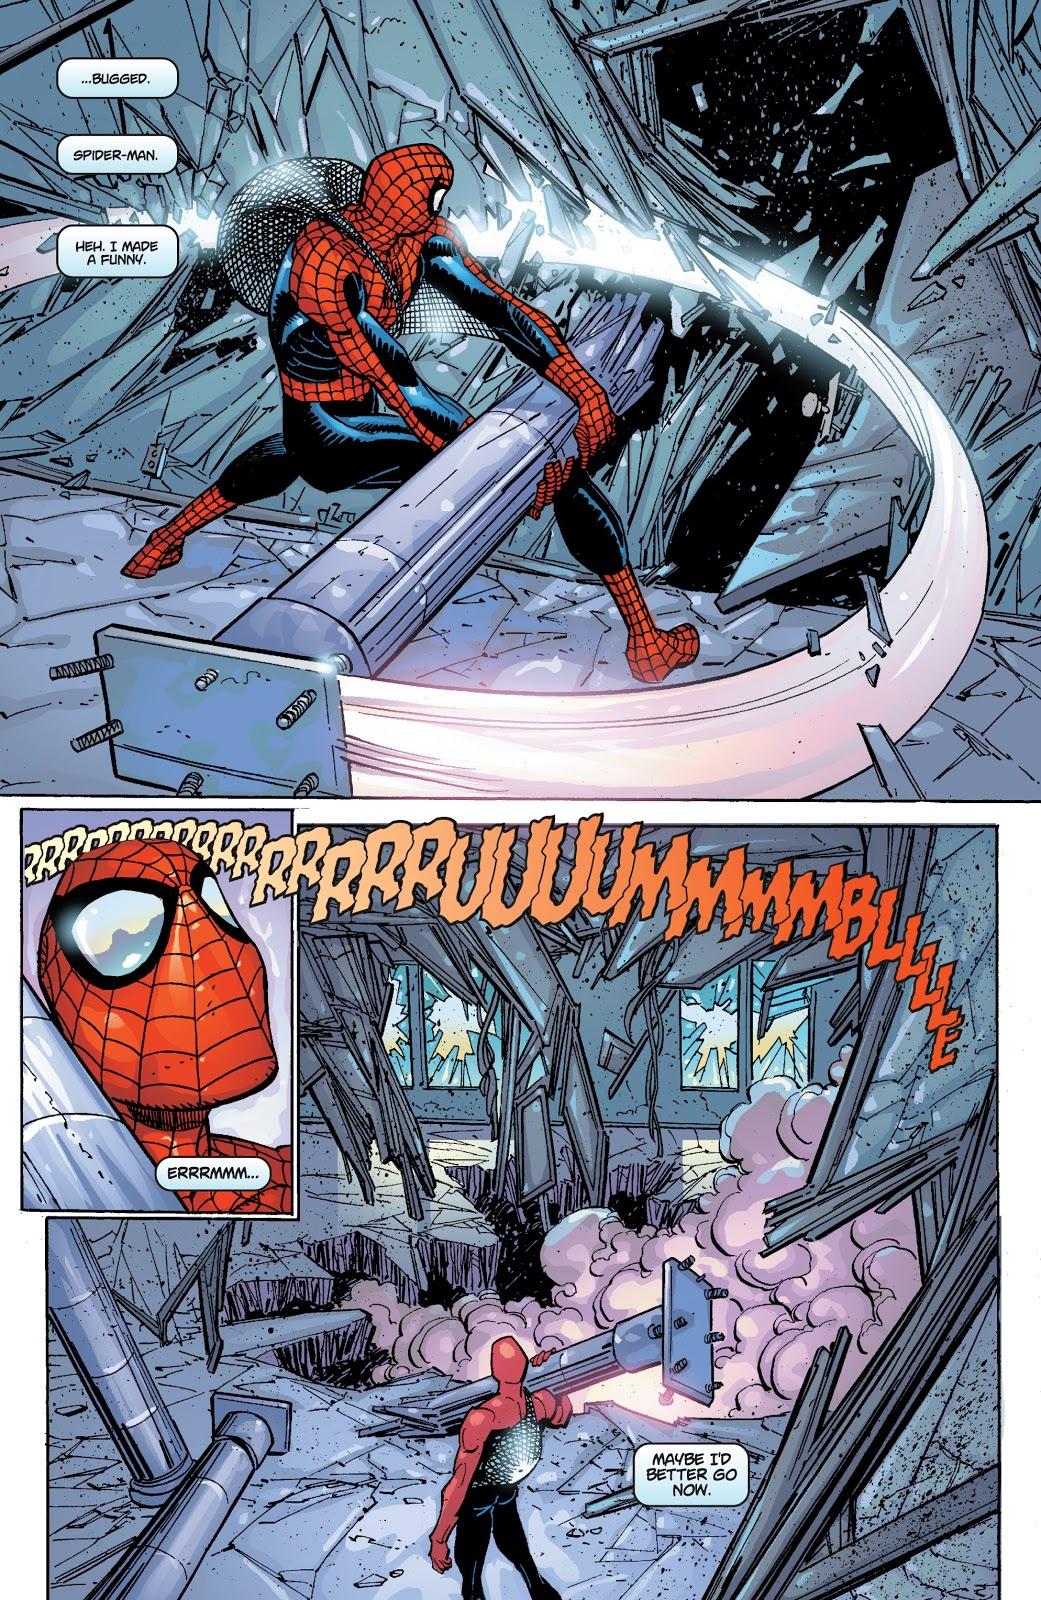 Spider-Man Wrecks A Building